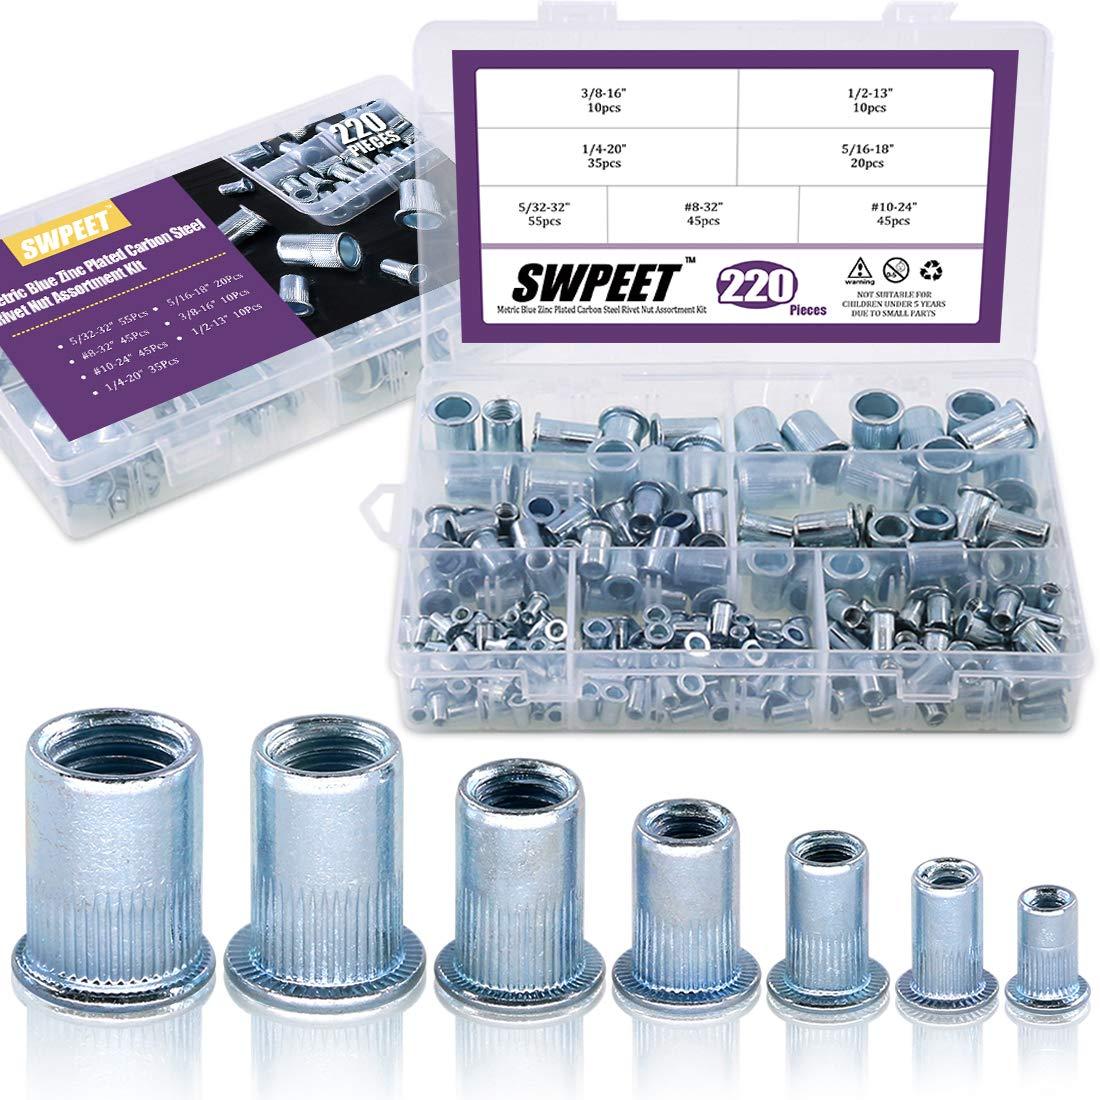 Swpeet 220Pcs 7 Sizes Imperial Zinc Plated Carbon Steel Blue White Knurled Rivet Nut Flat Head Threaded Insert Nutsert Assortment Kit